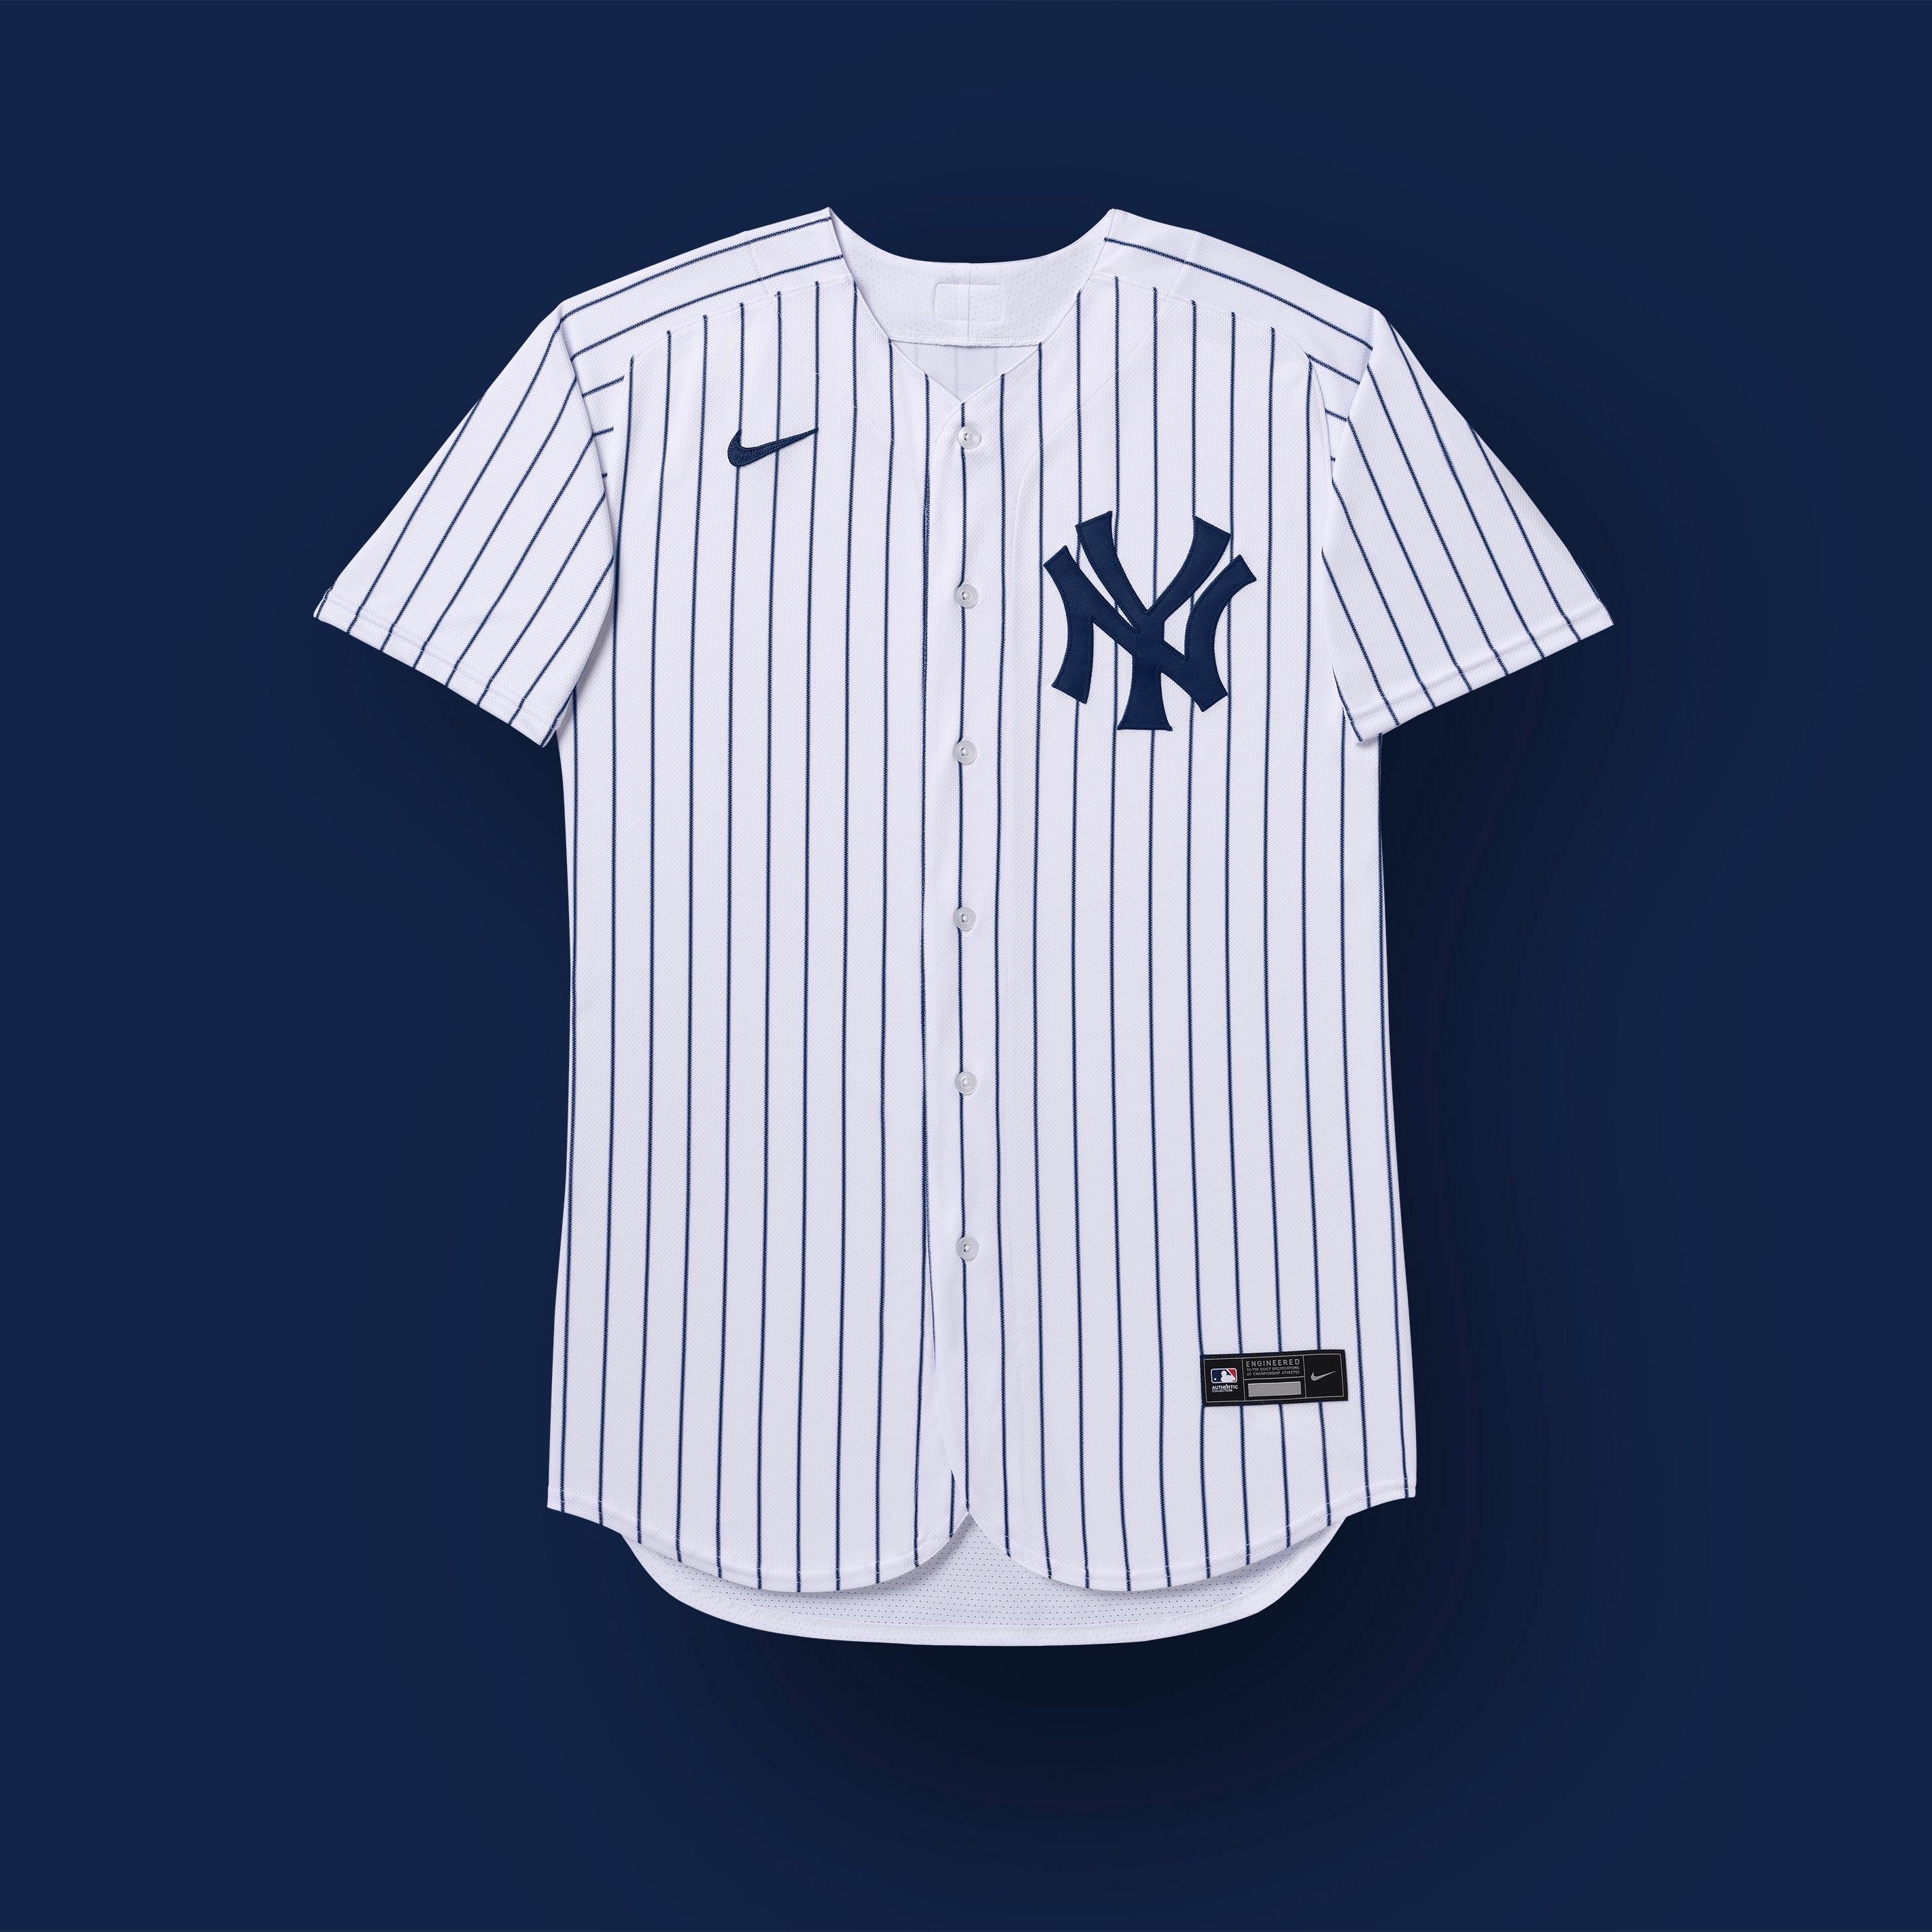 new york yankees 2020 uniforms